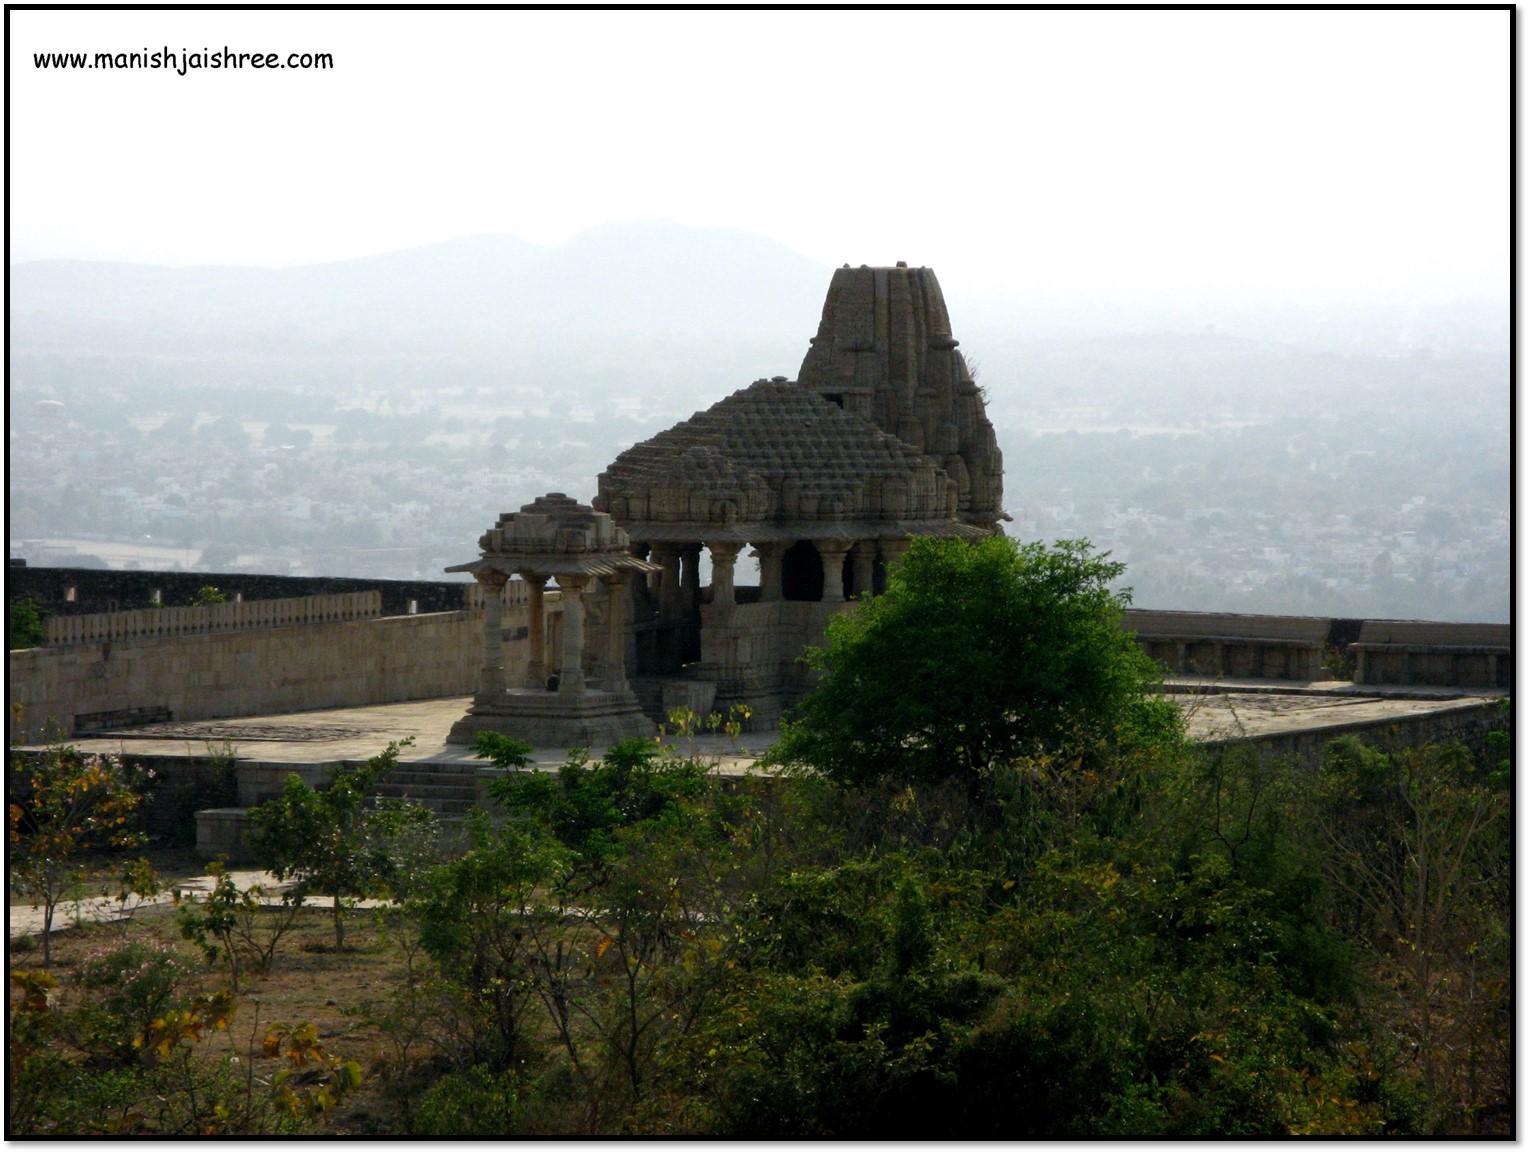 The Shiva Temple, Chittorgarh fort